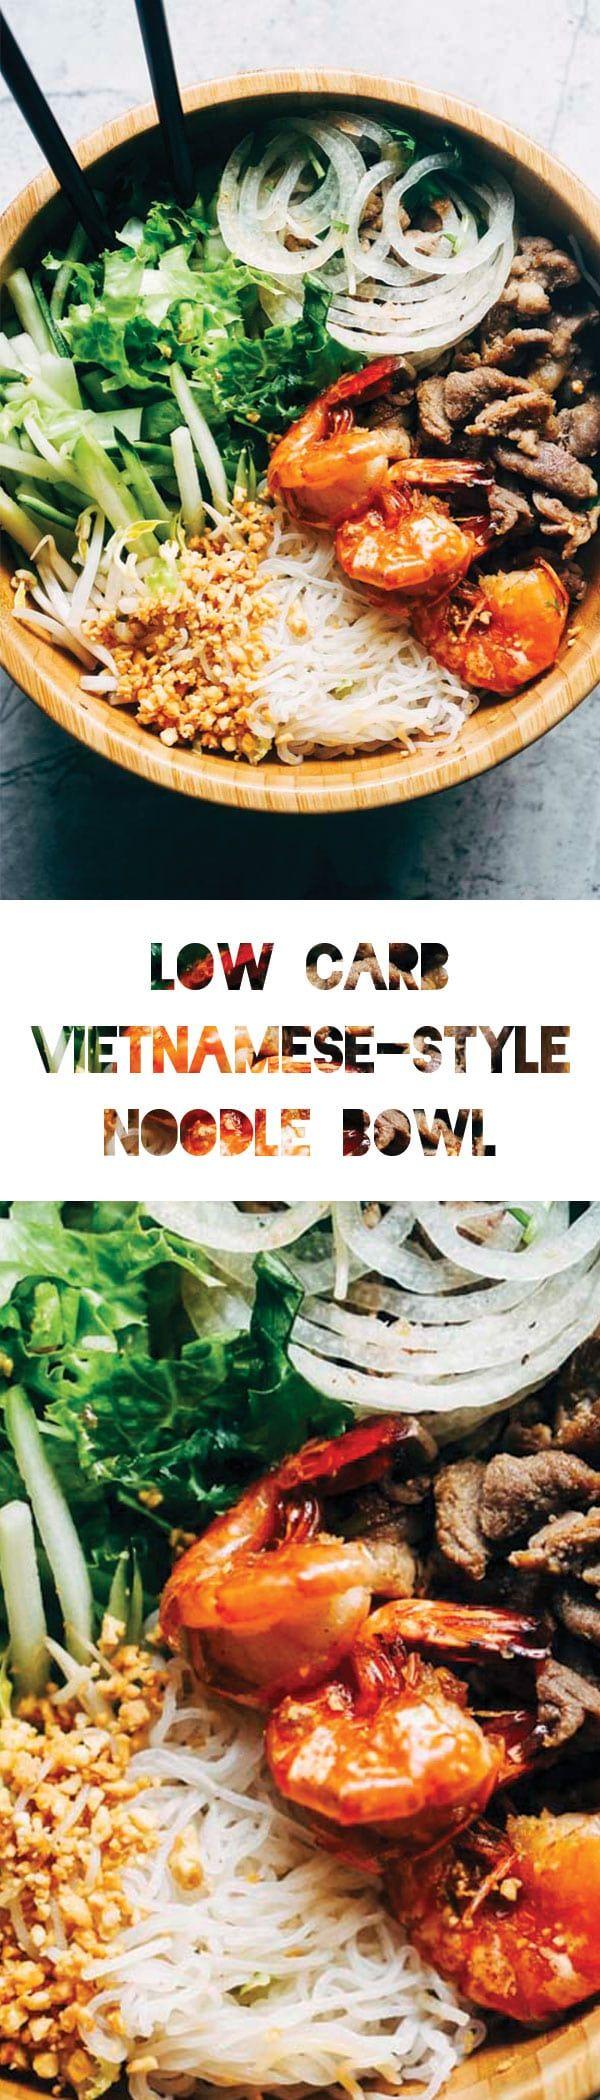 Dieta low carb | Retete Low Carb